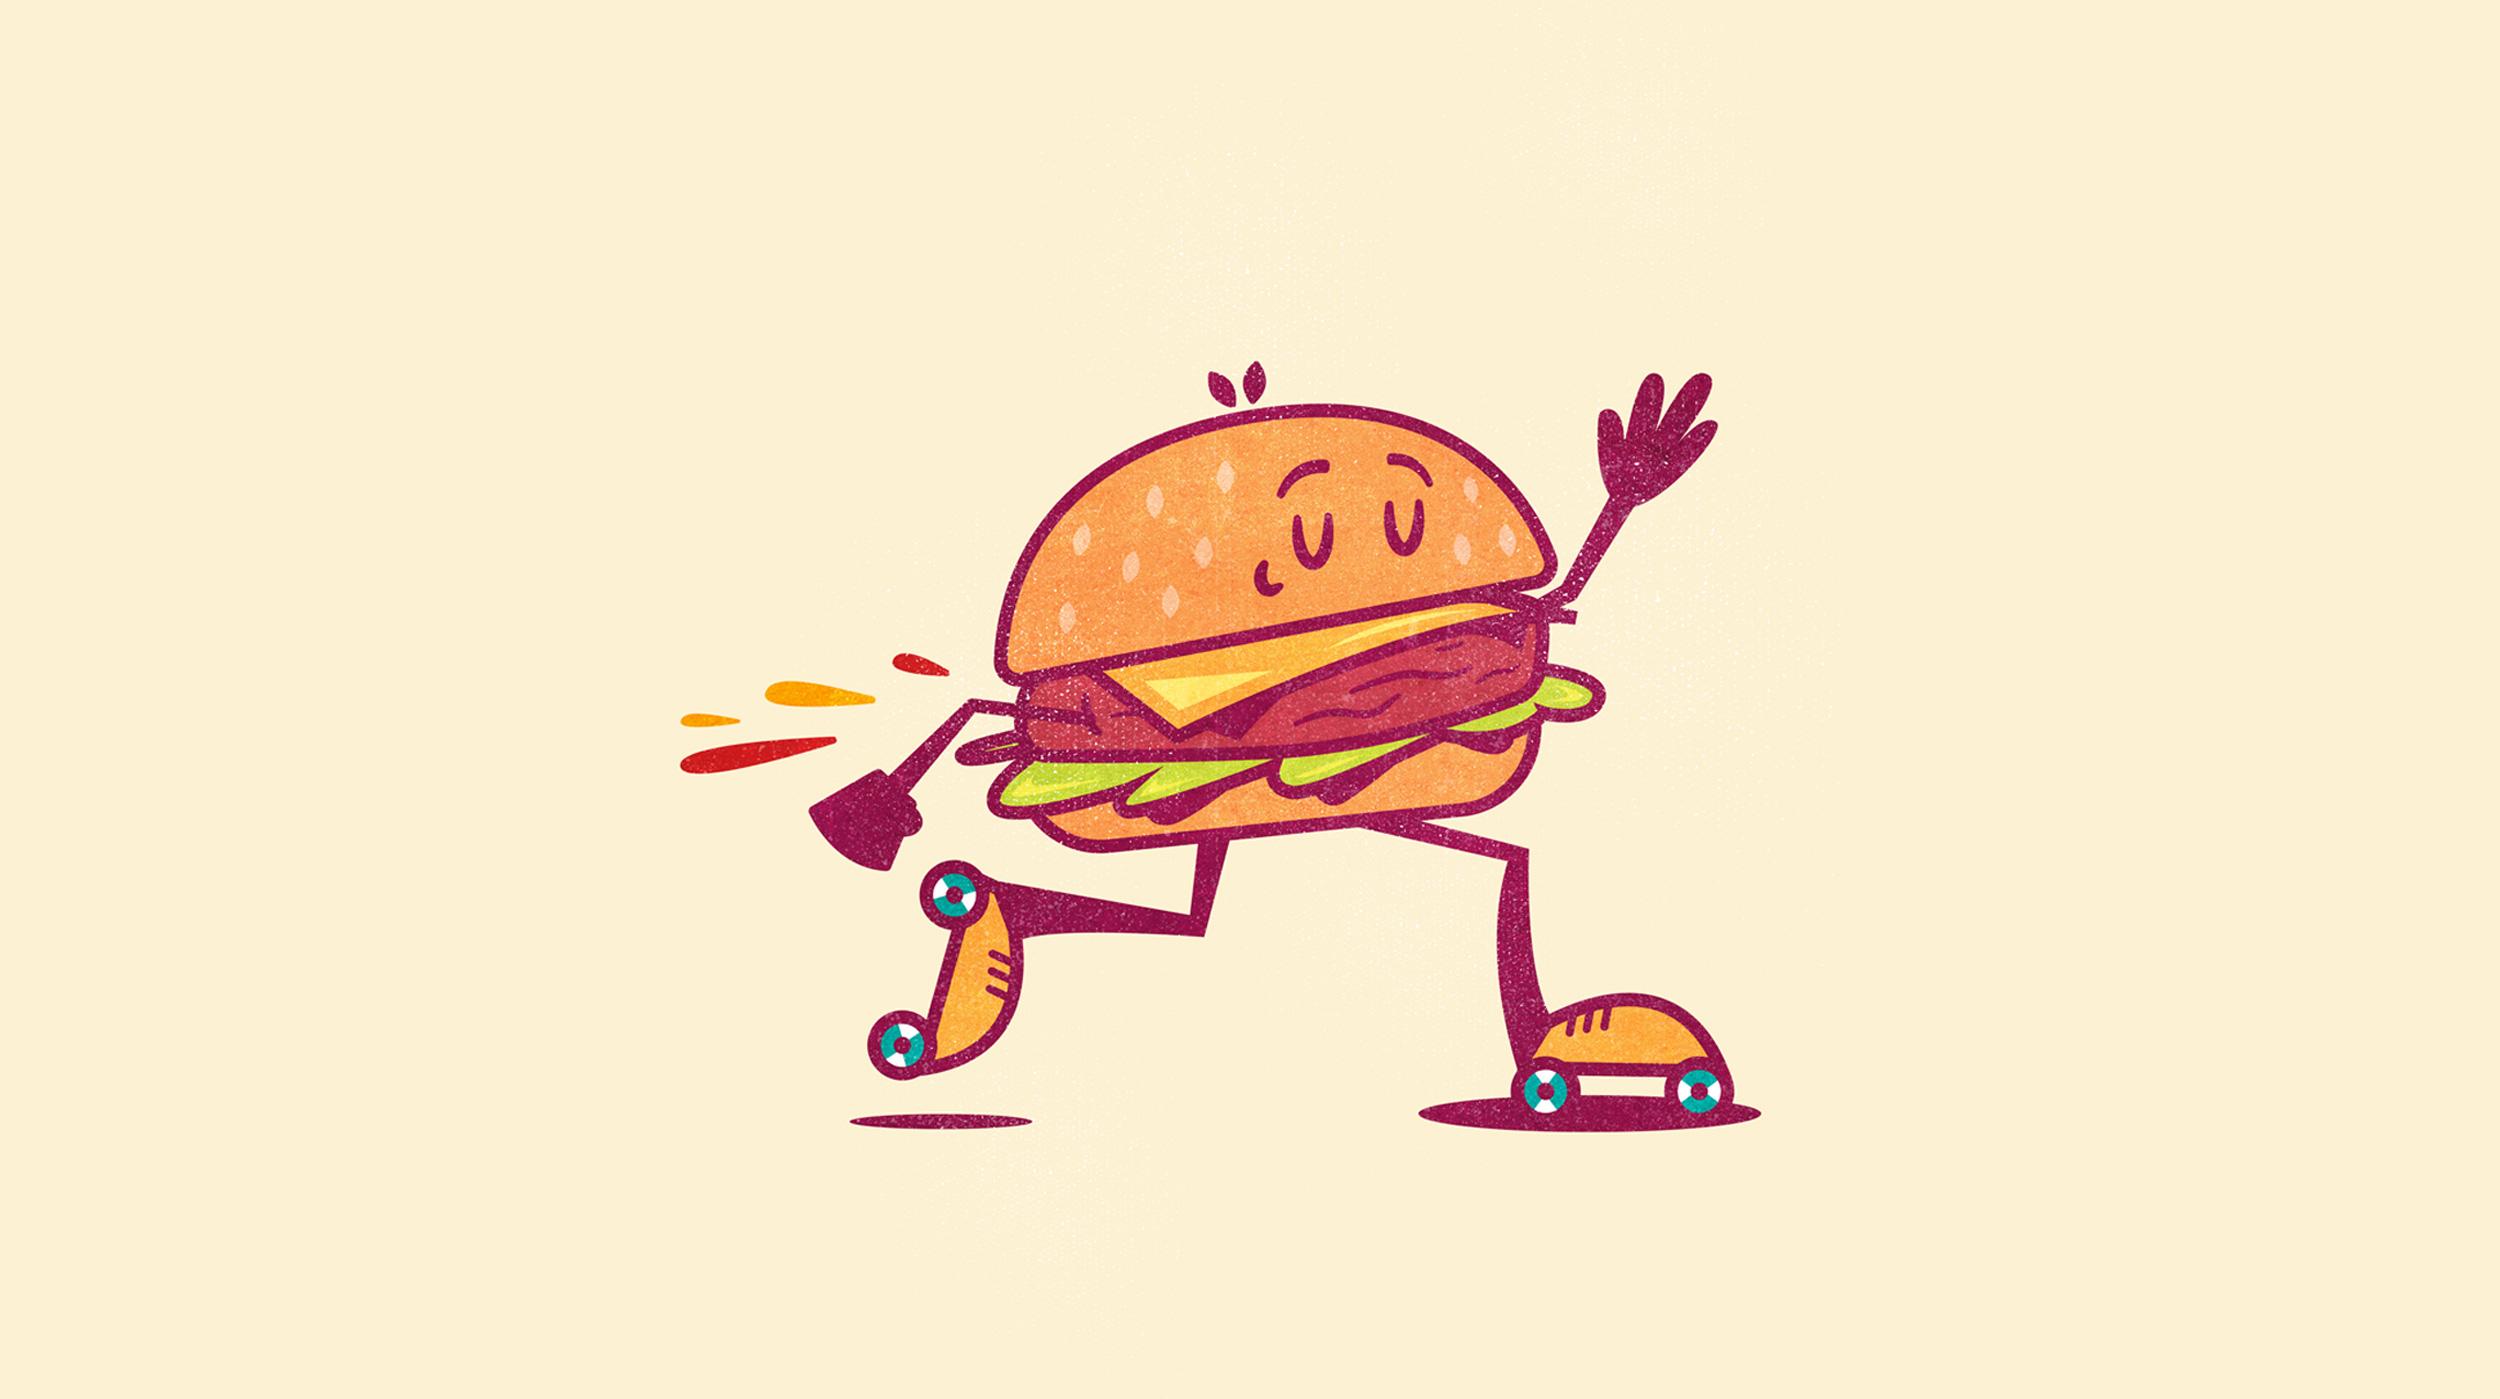 Eat-Goshen_Visuals_c4